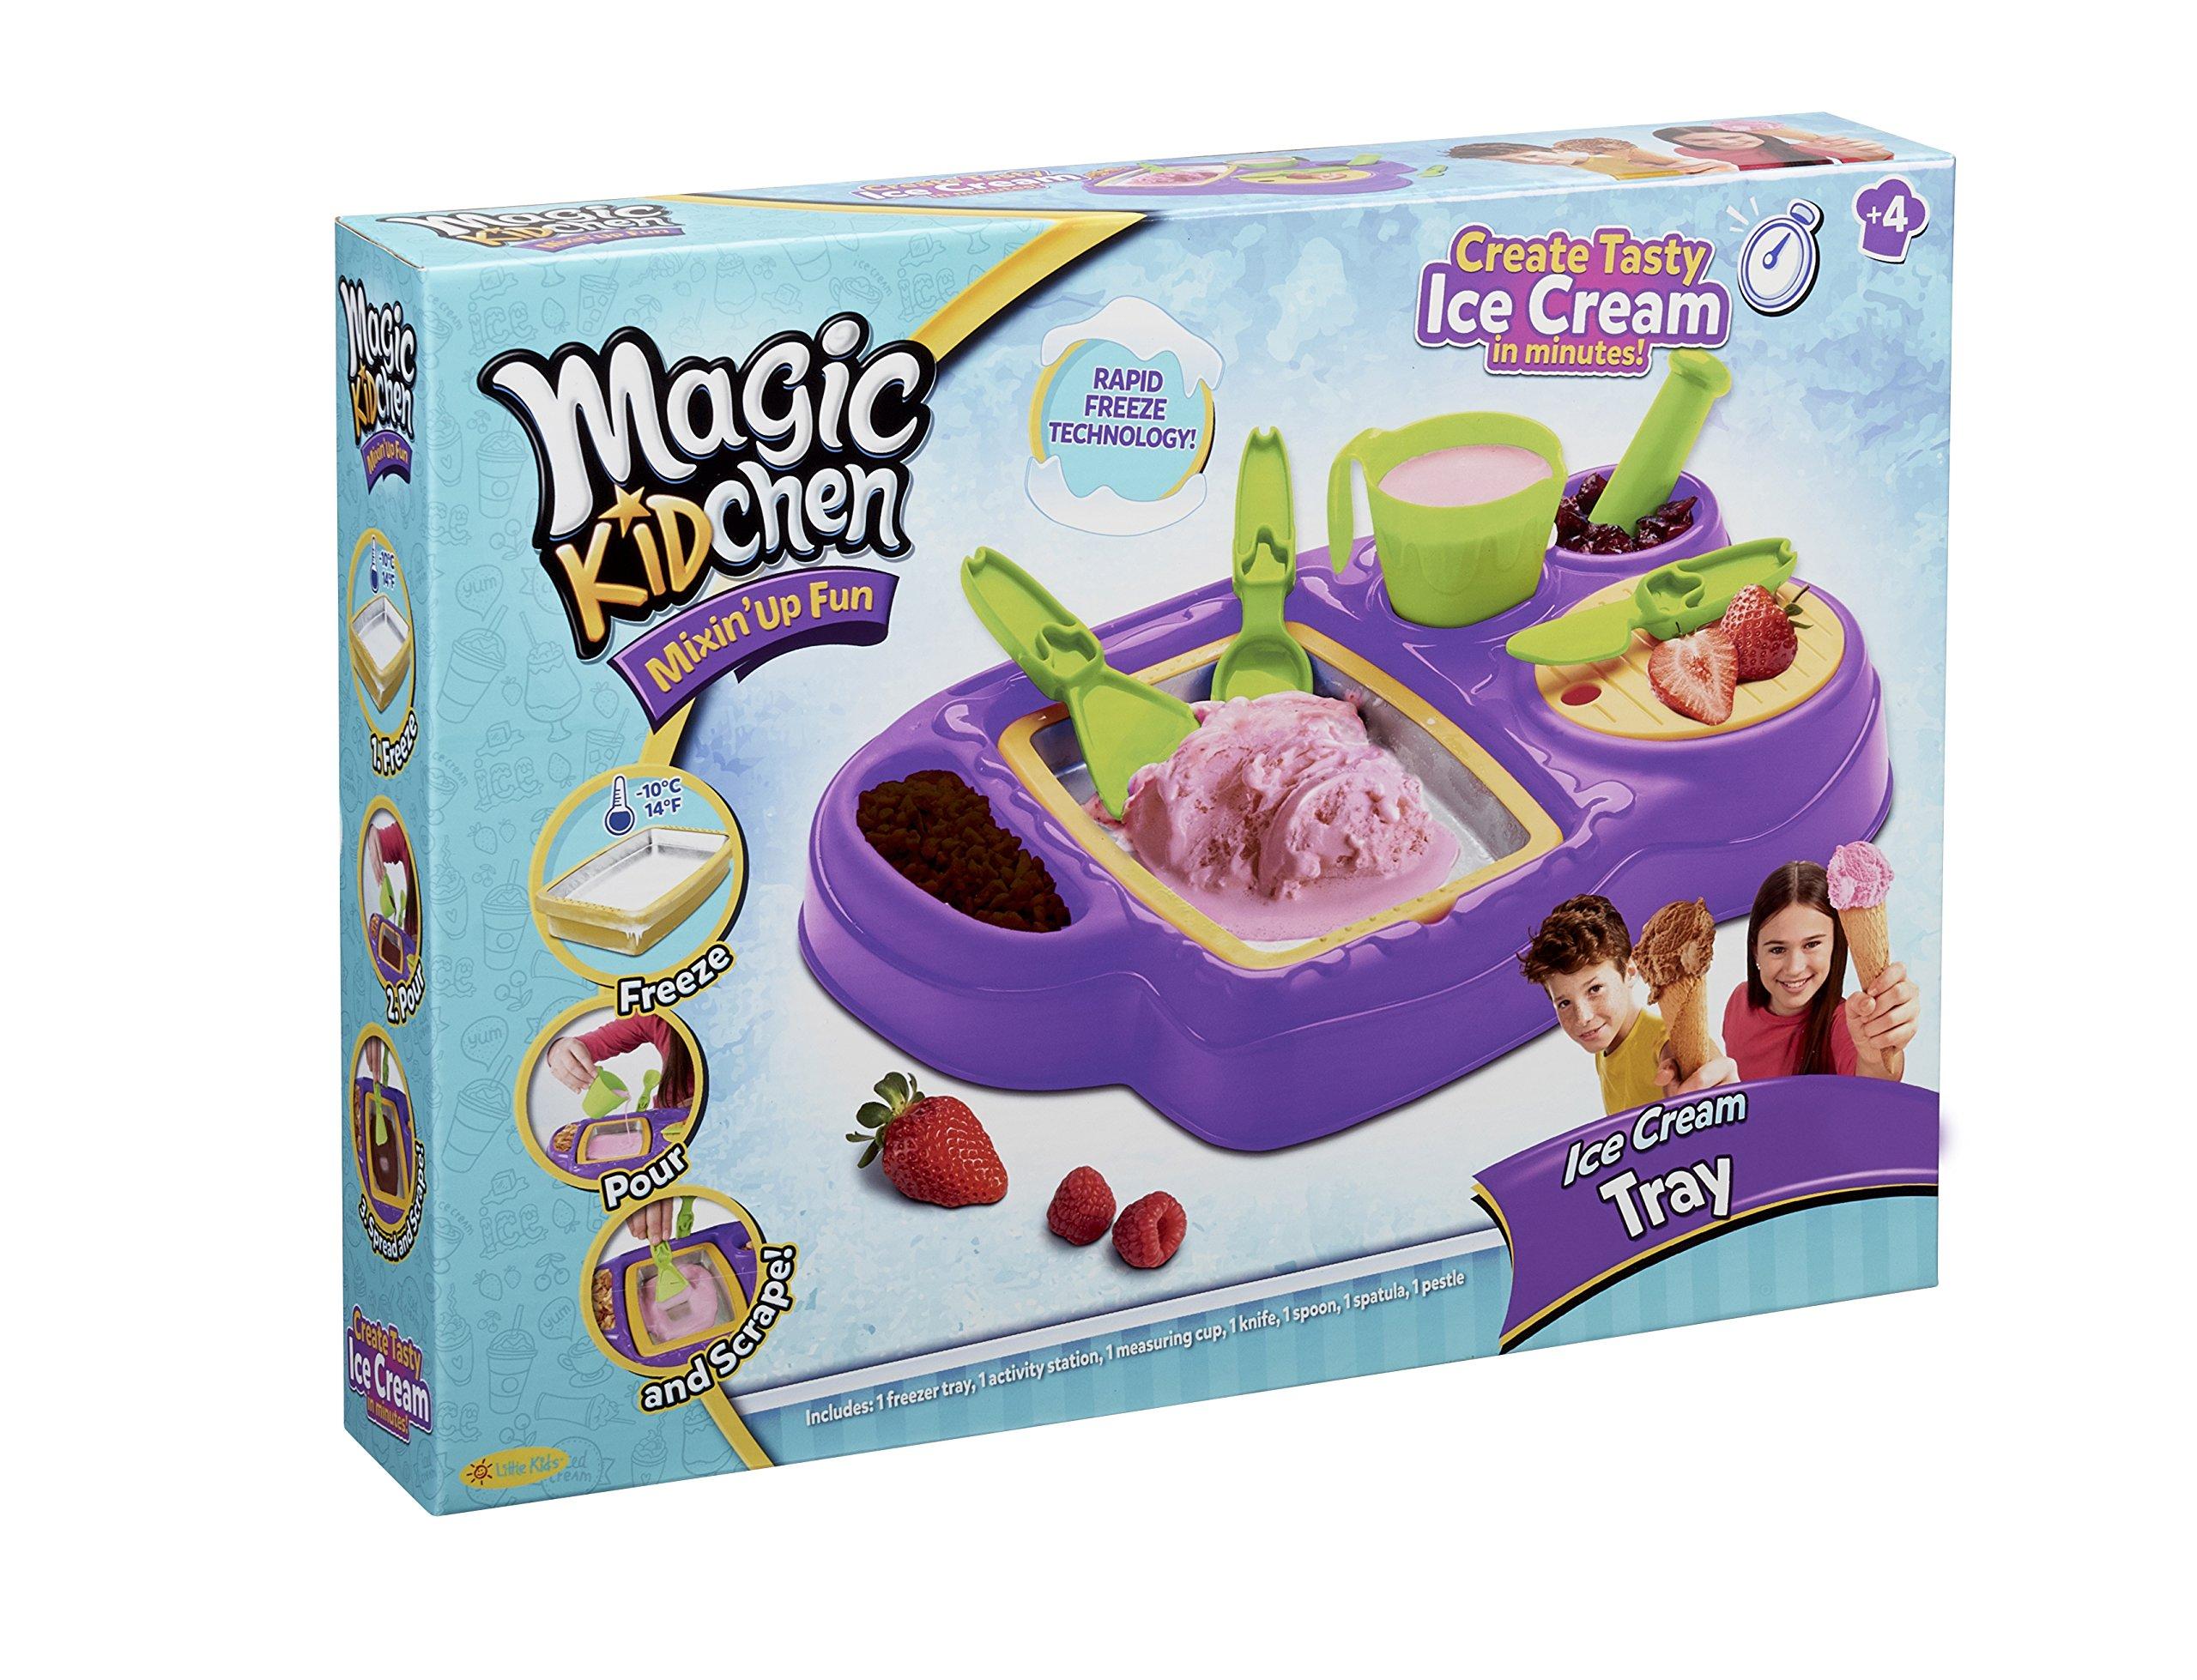 Little Kids Ingredients Friendly Activity